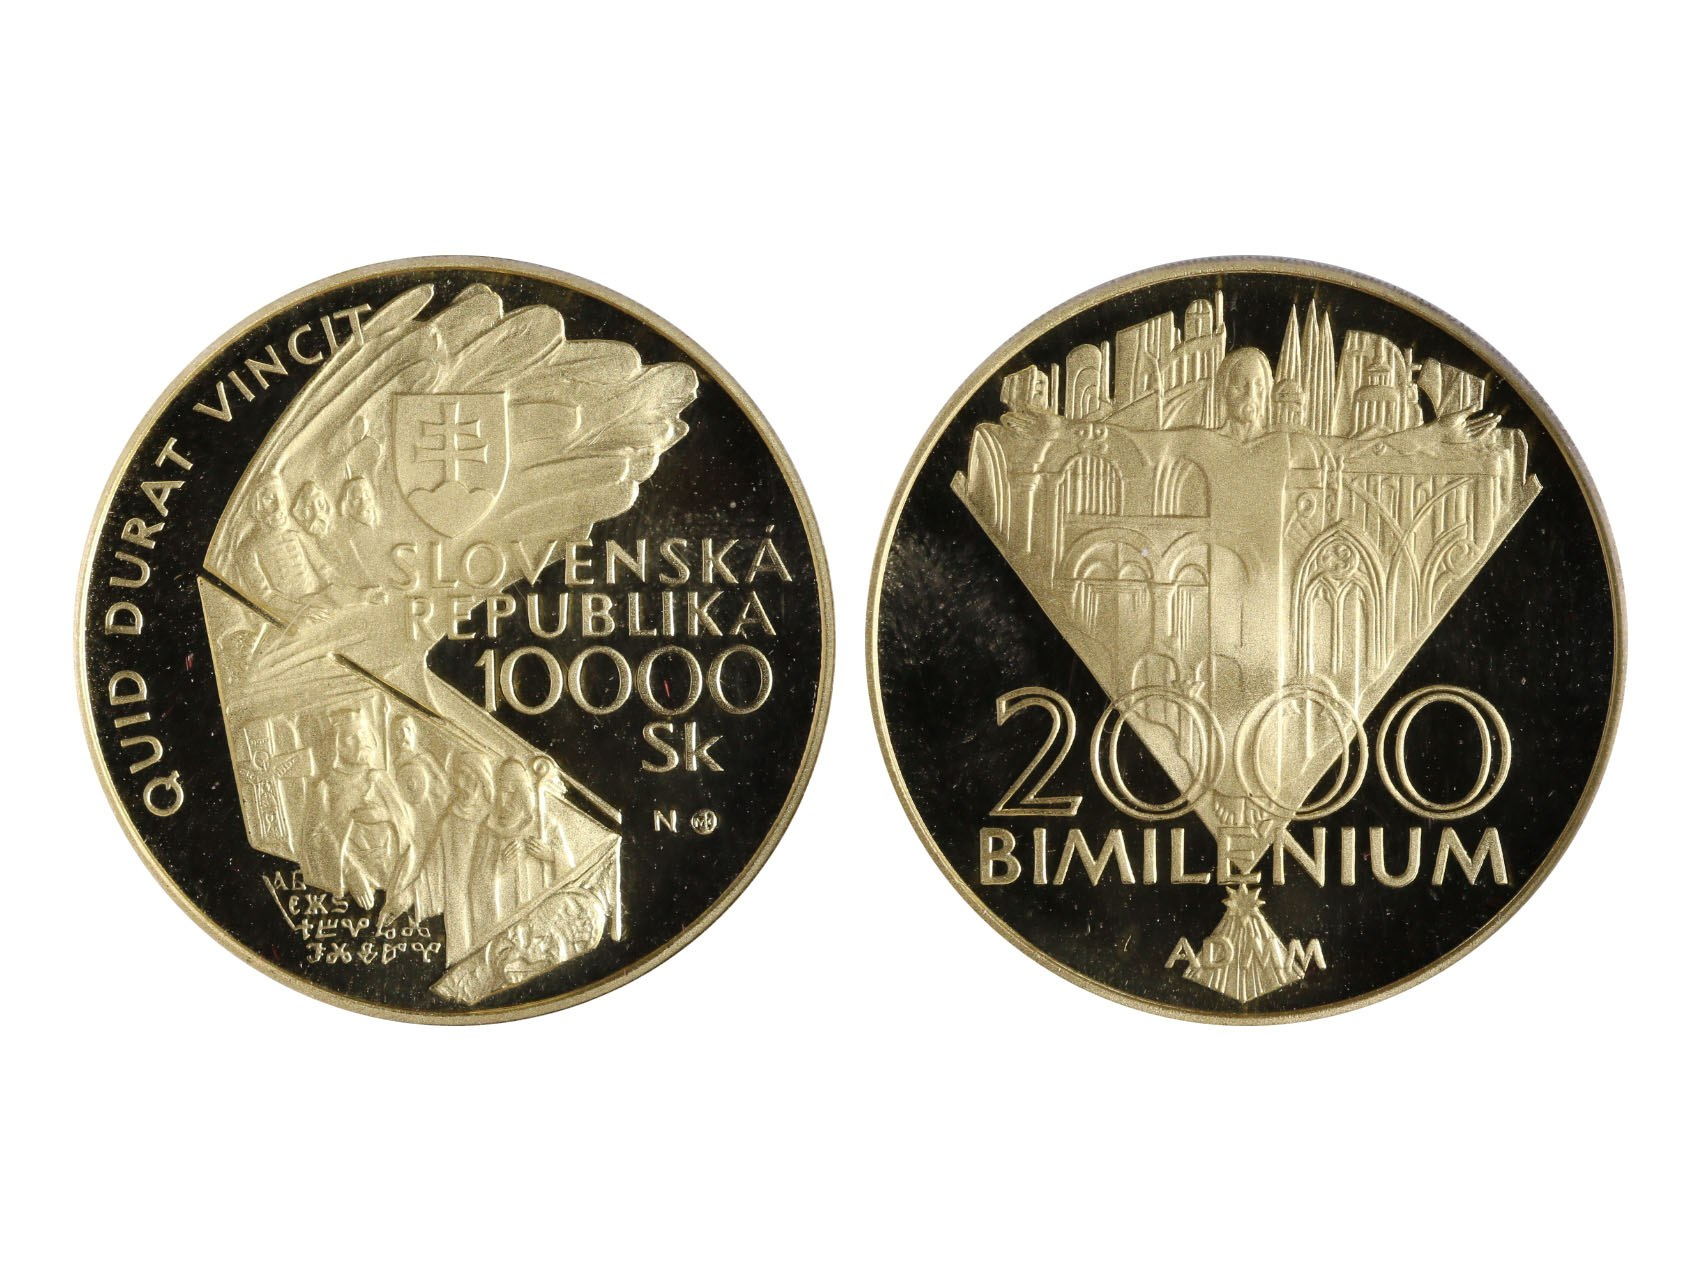 Slovenská Republika 1993 - 10000 Sk 2000 Bimilénium, etue, certifikát, N5